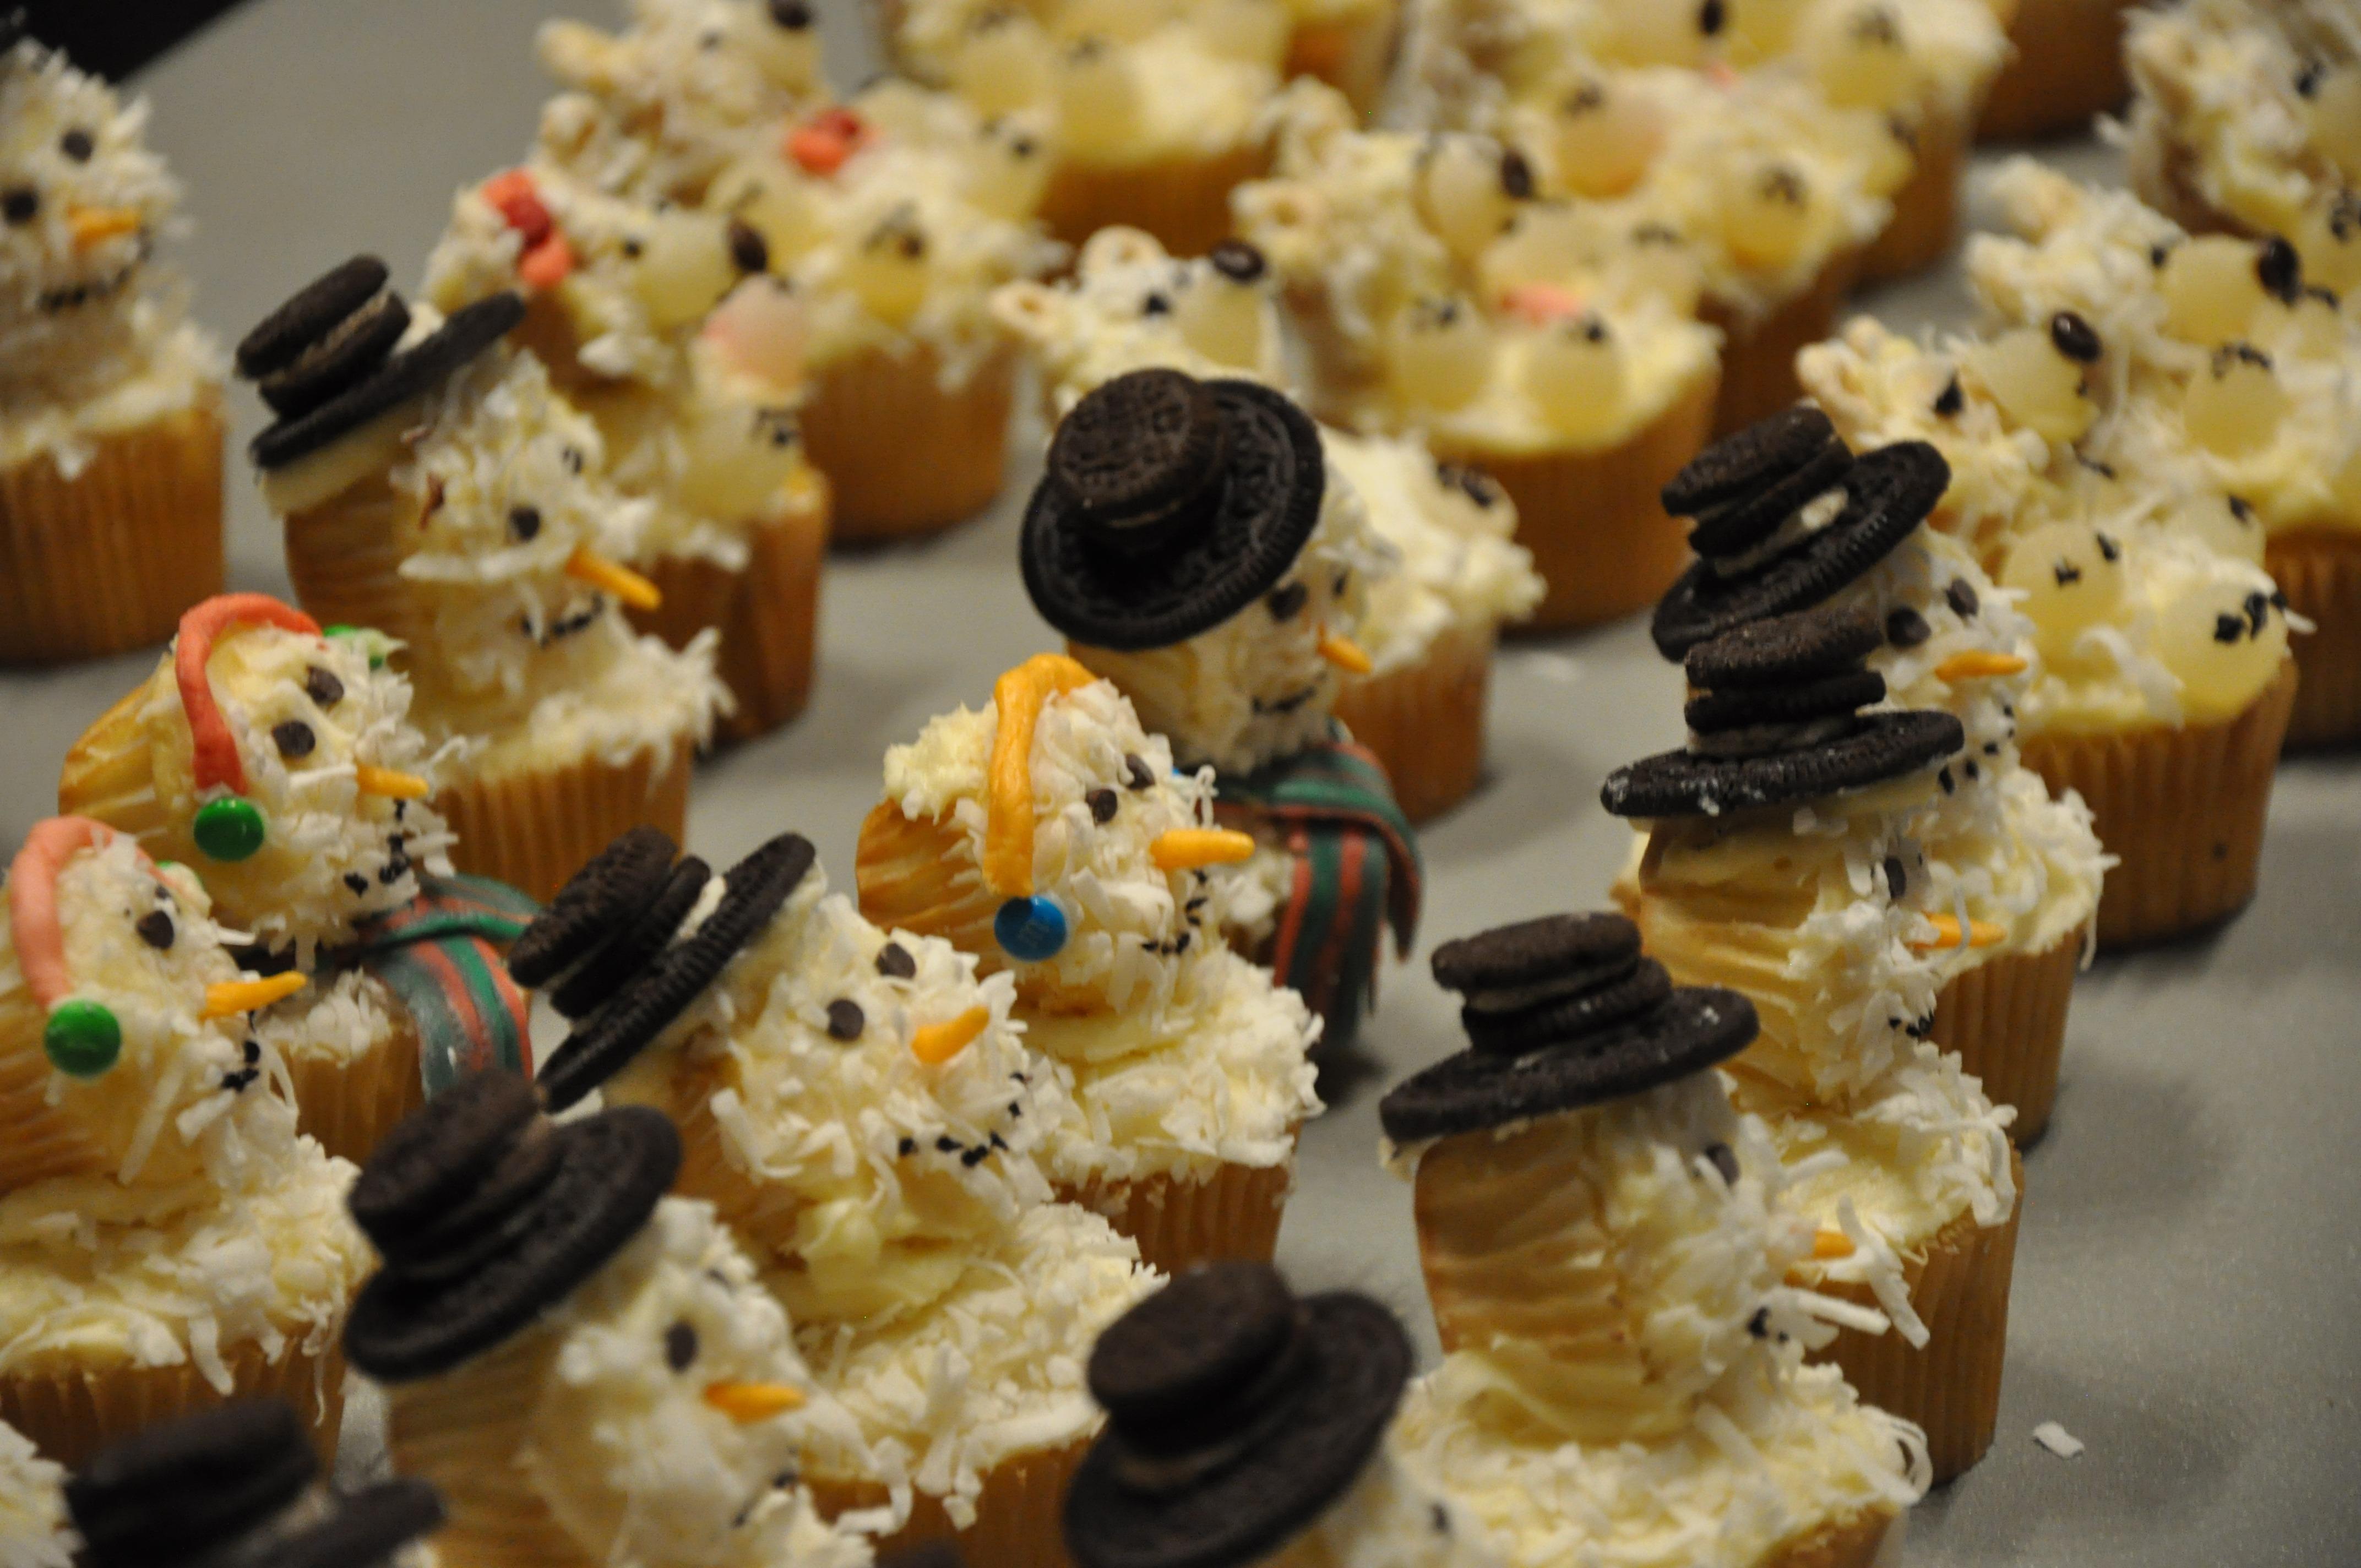 Free Images : sweet, celebration, decoration, holiday, fresh, junk, cupcake, baking, frosting, gourmet, christmas, dessert, indulgence, cream, delicious, ...